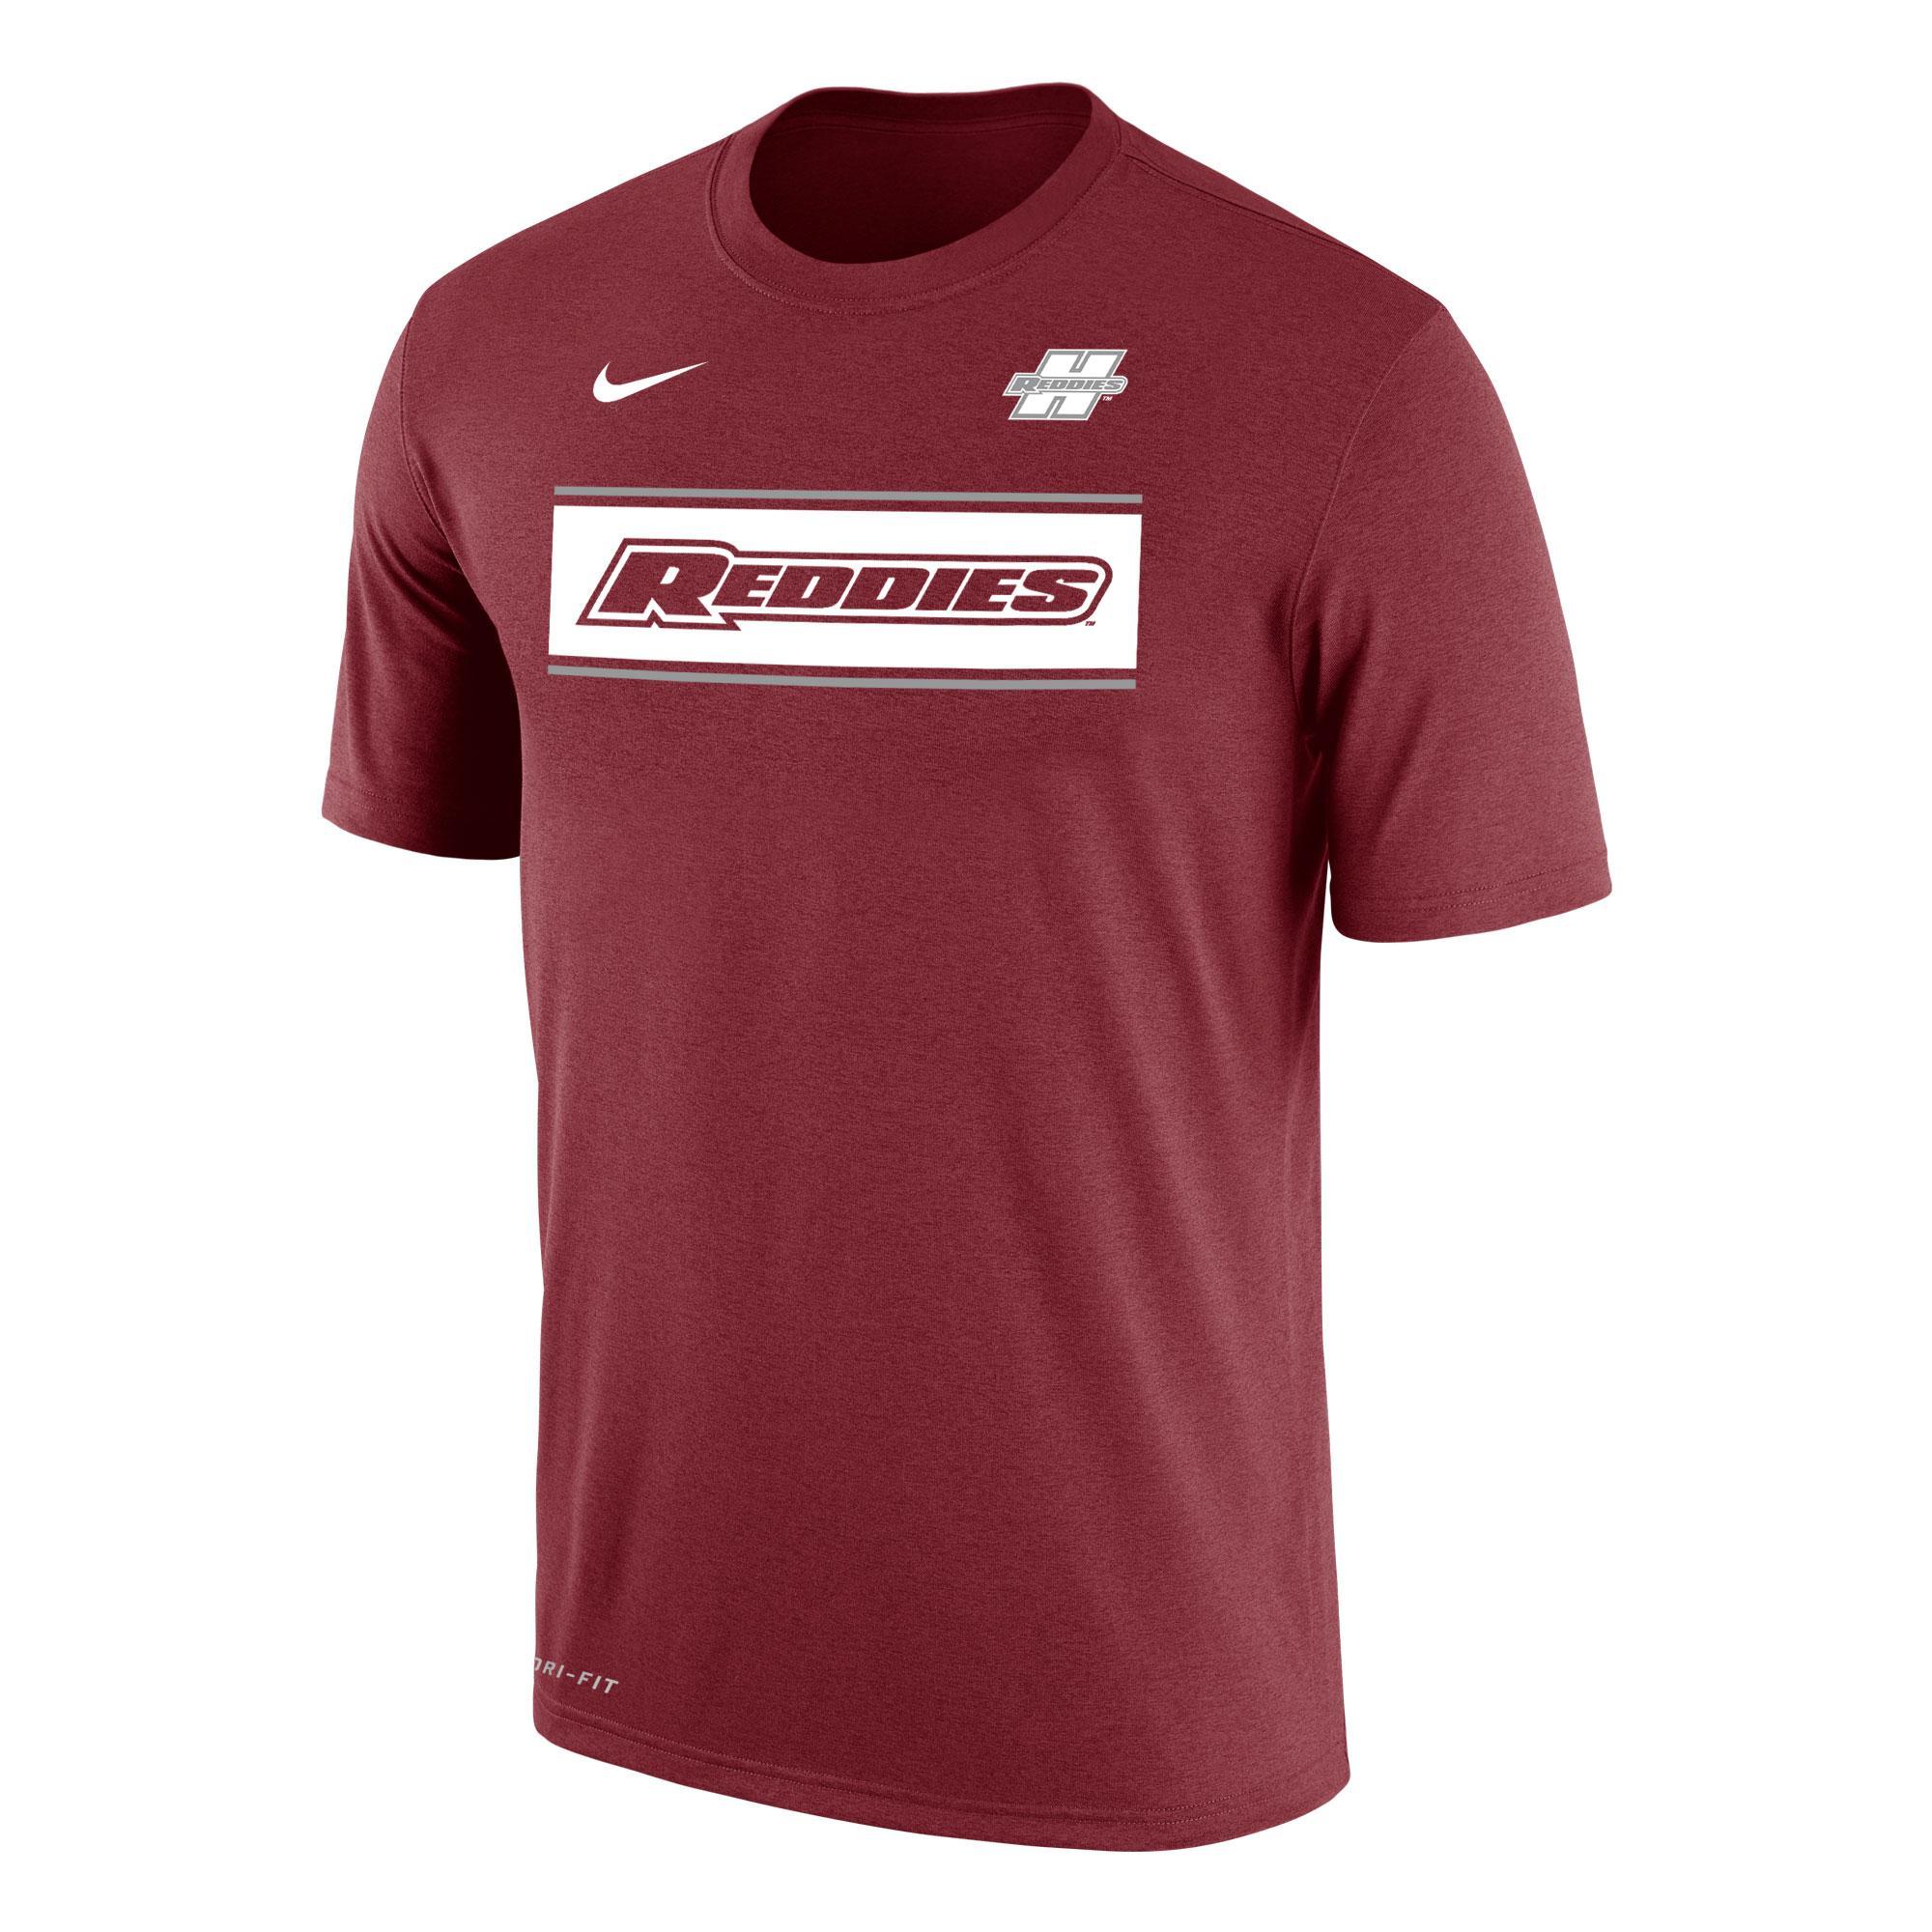 image of: Henderson Reddies Dri-FIT Cotton Short Sleeve T-Shirt